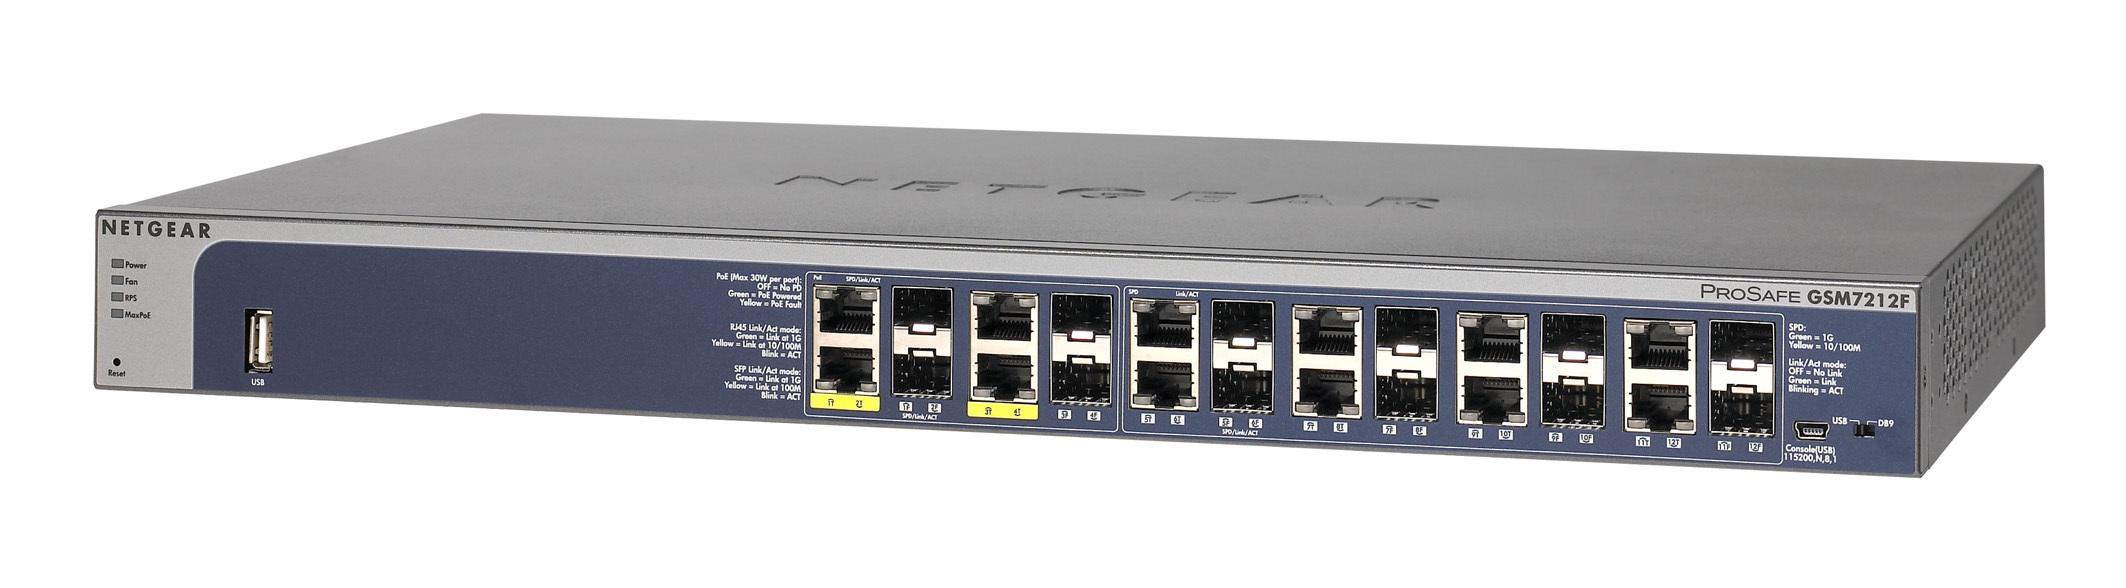 Netgear ProSafe GSM7212F gemanaged L2+ Energie Über Ethernet (PoE) Unterstützung Grau